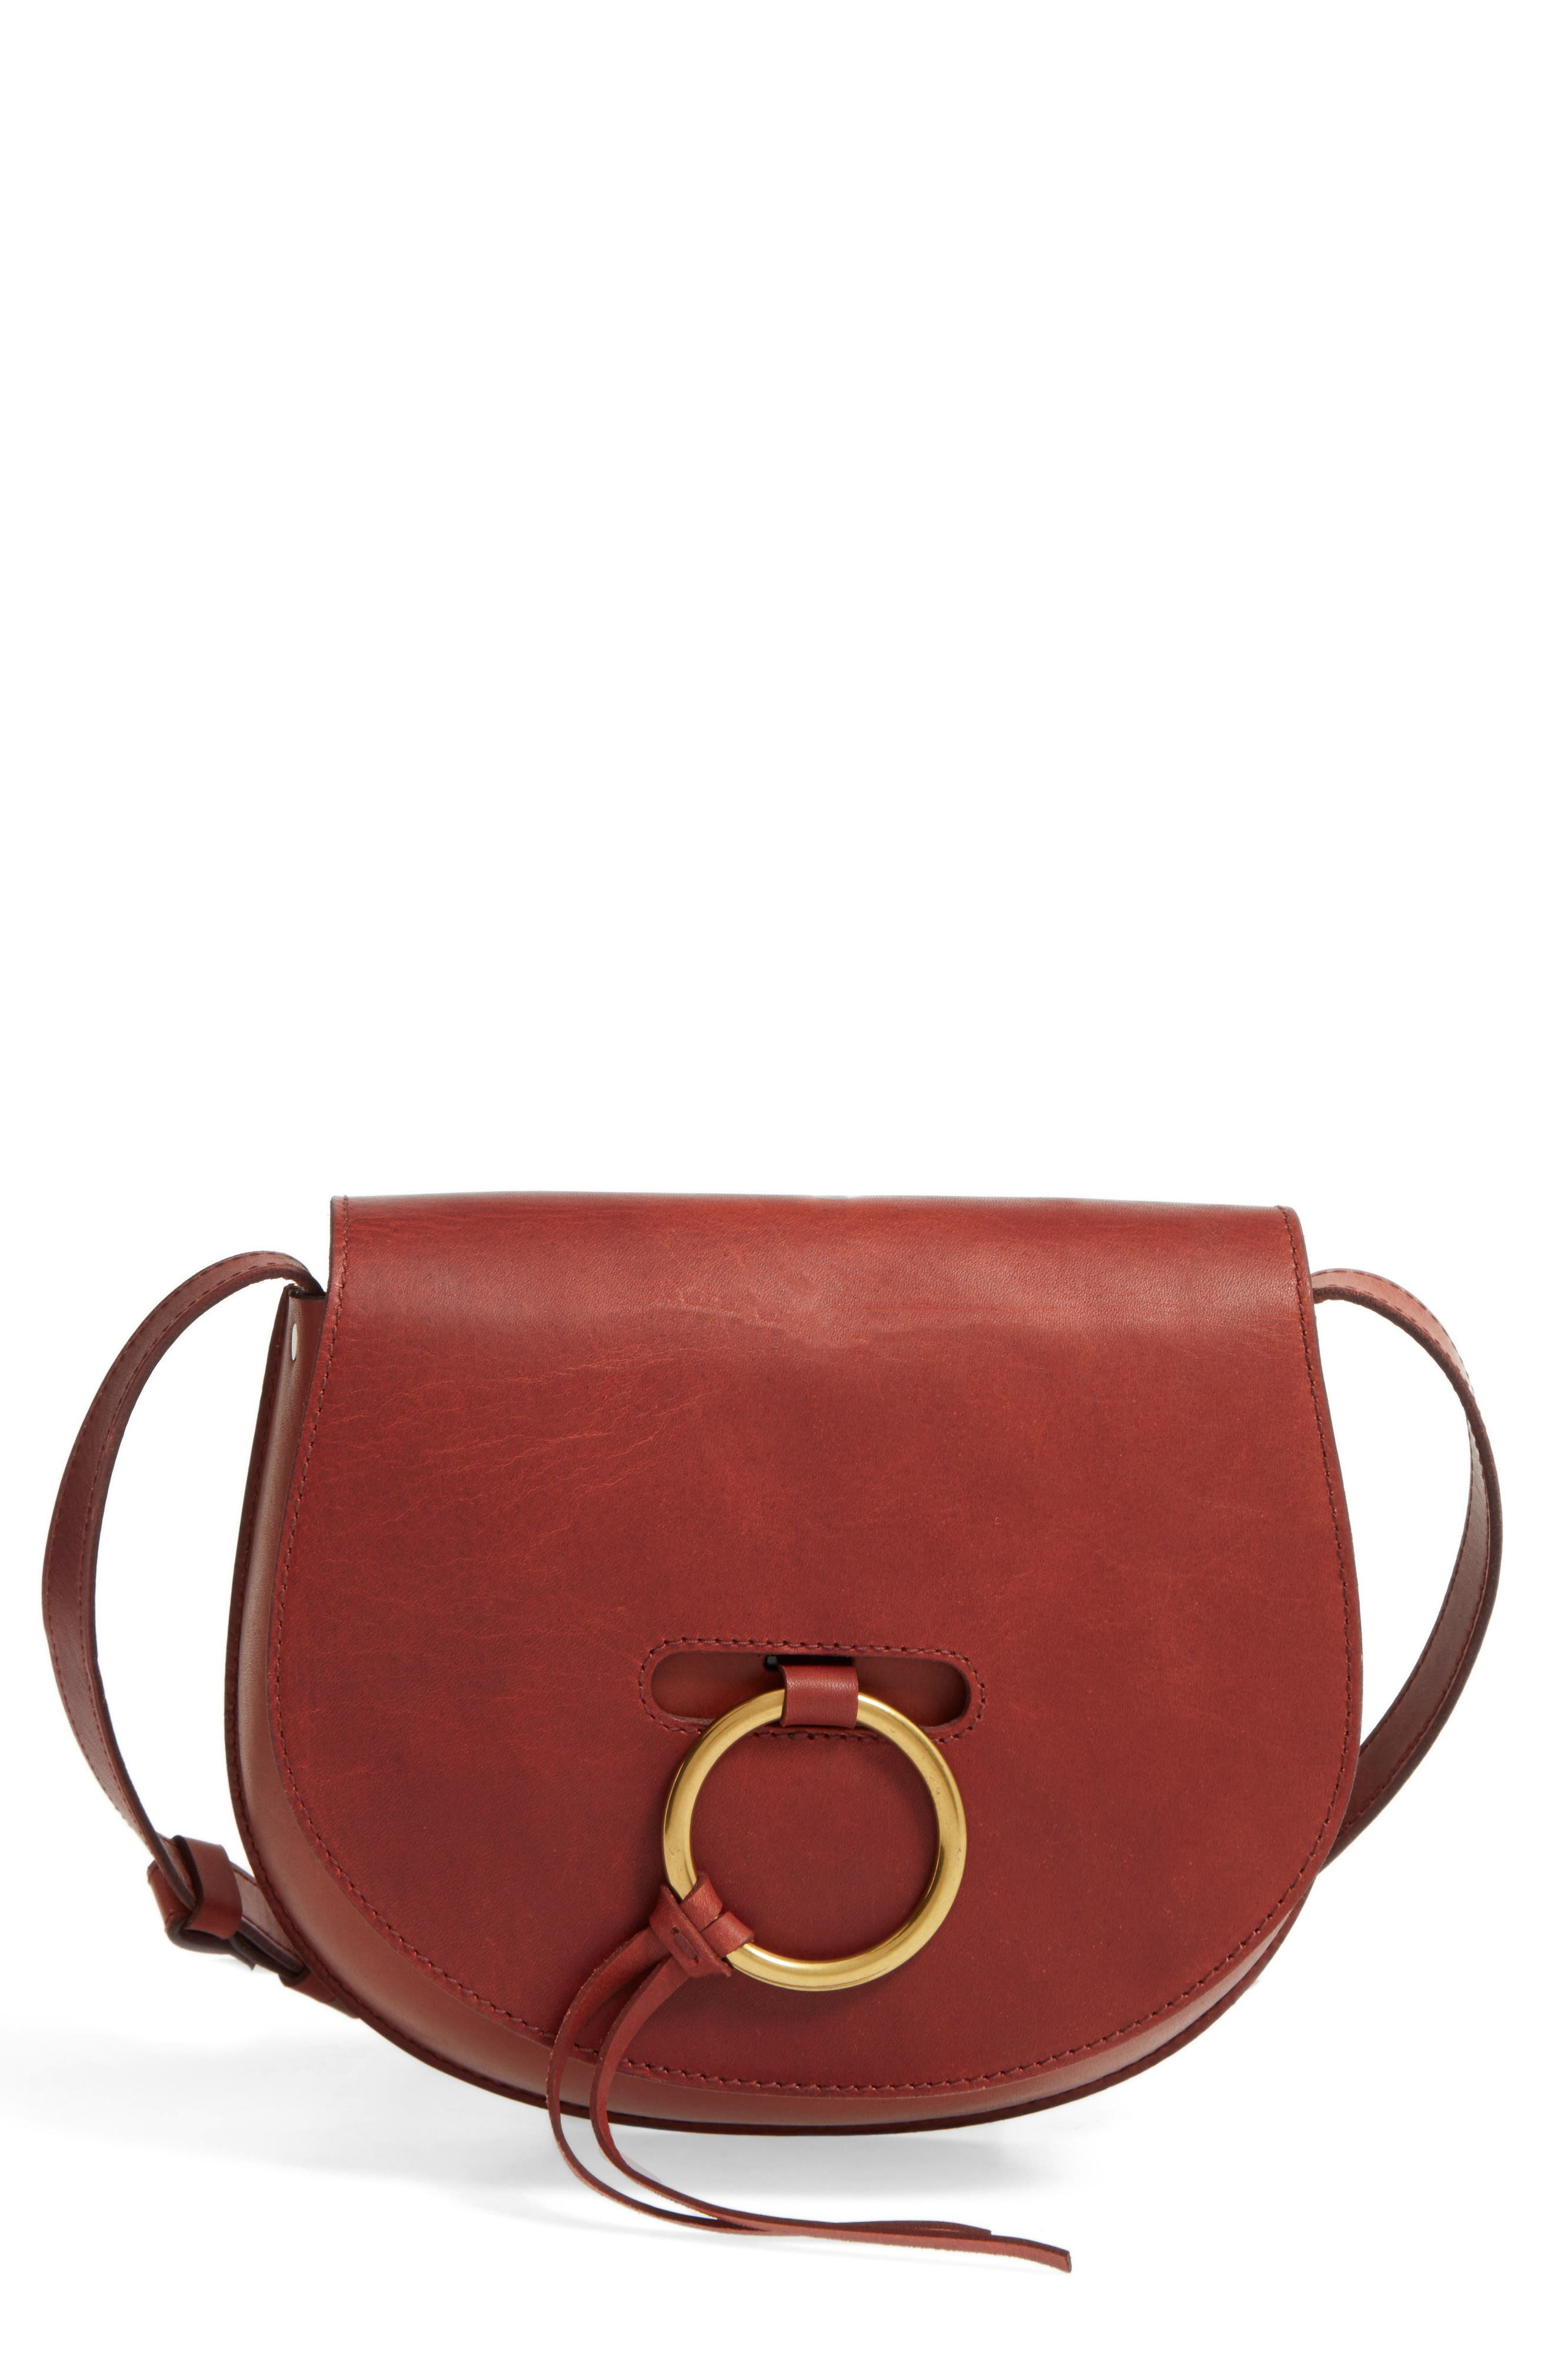 O-Ring Leather Saddle Bag,                             Main thumbnail 1, color,                             200